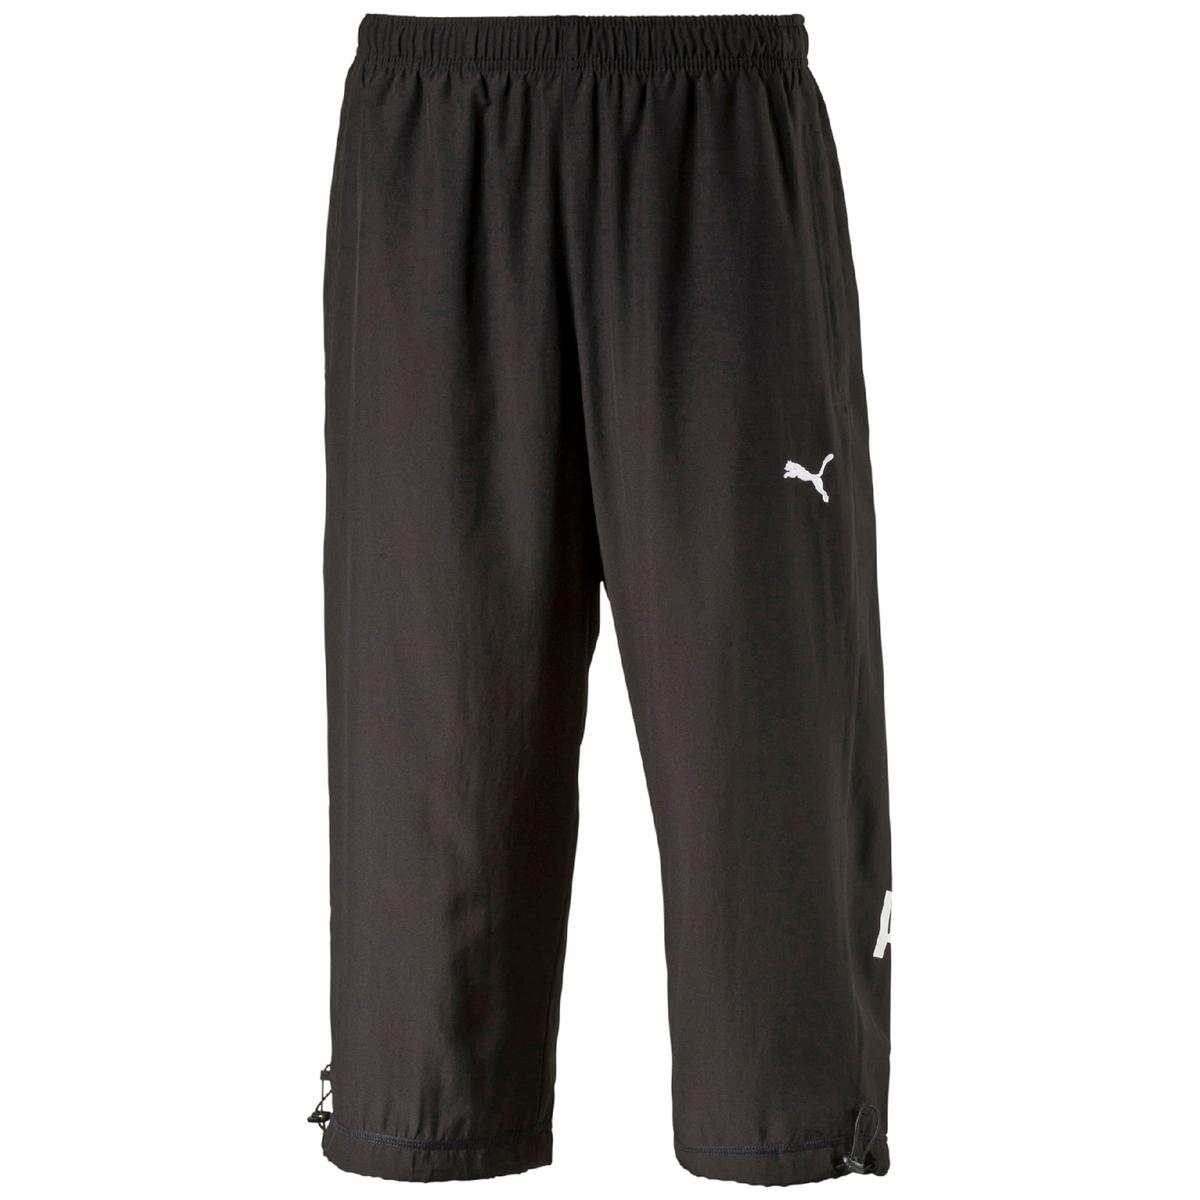 Pantaloni a pinocchietto sportivi